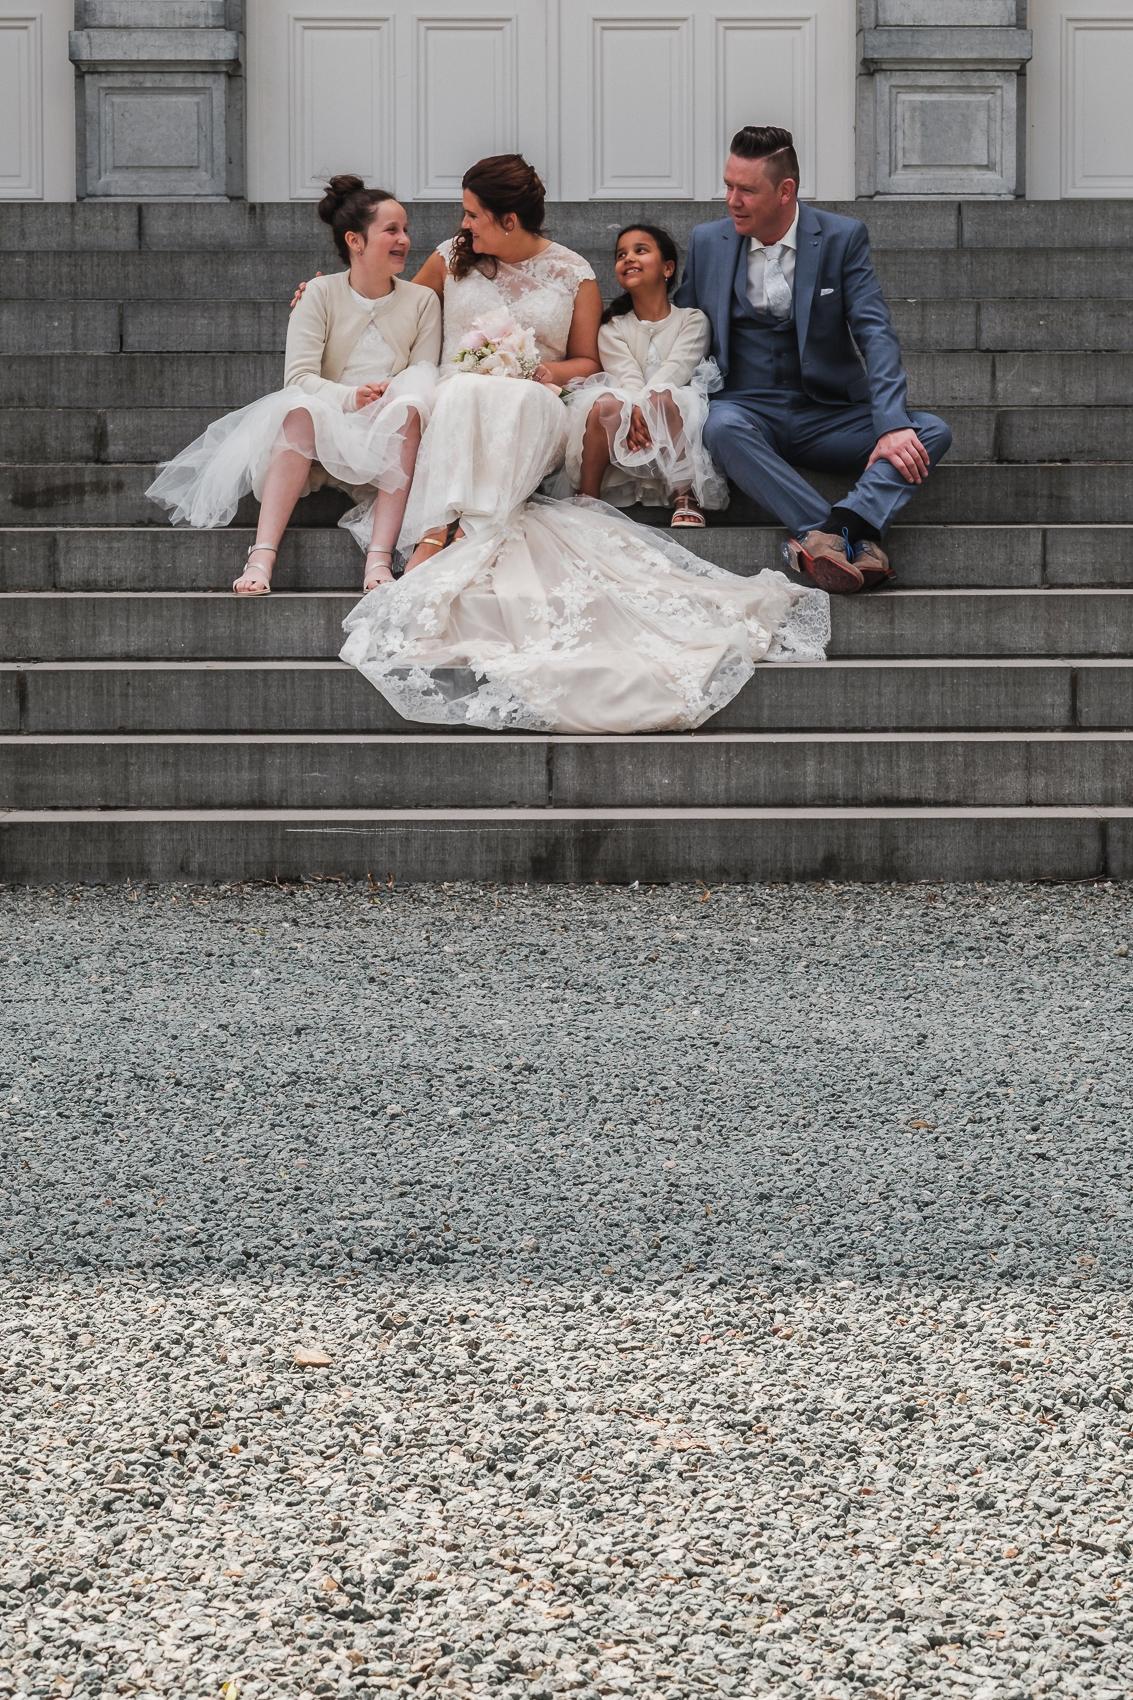 iso800 - trouwfotograaf gooik jana davy-23.jpg